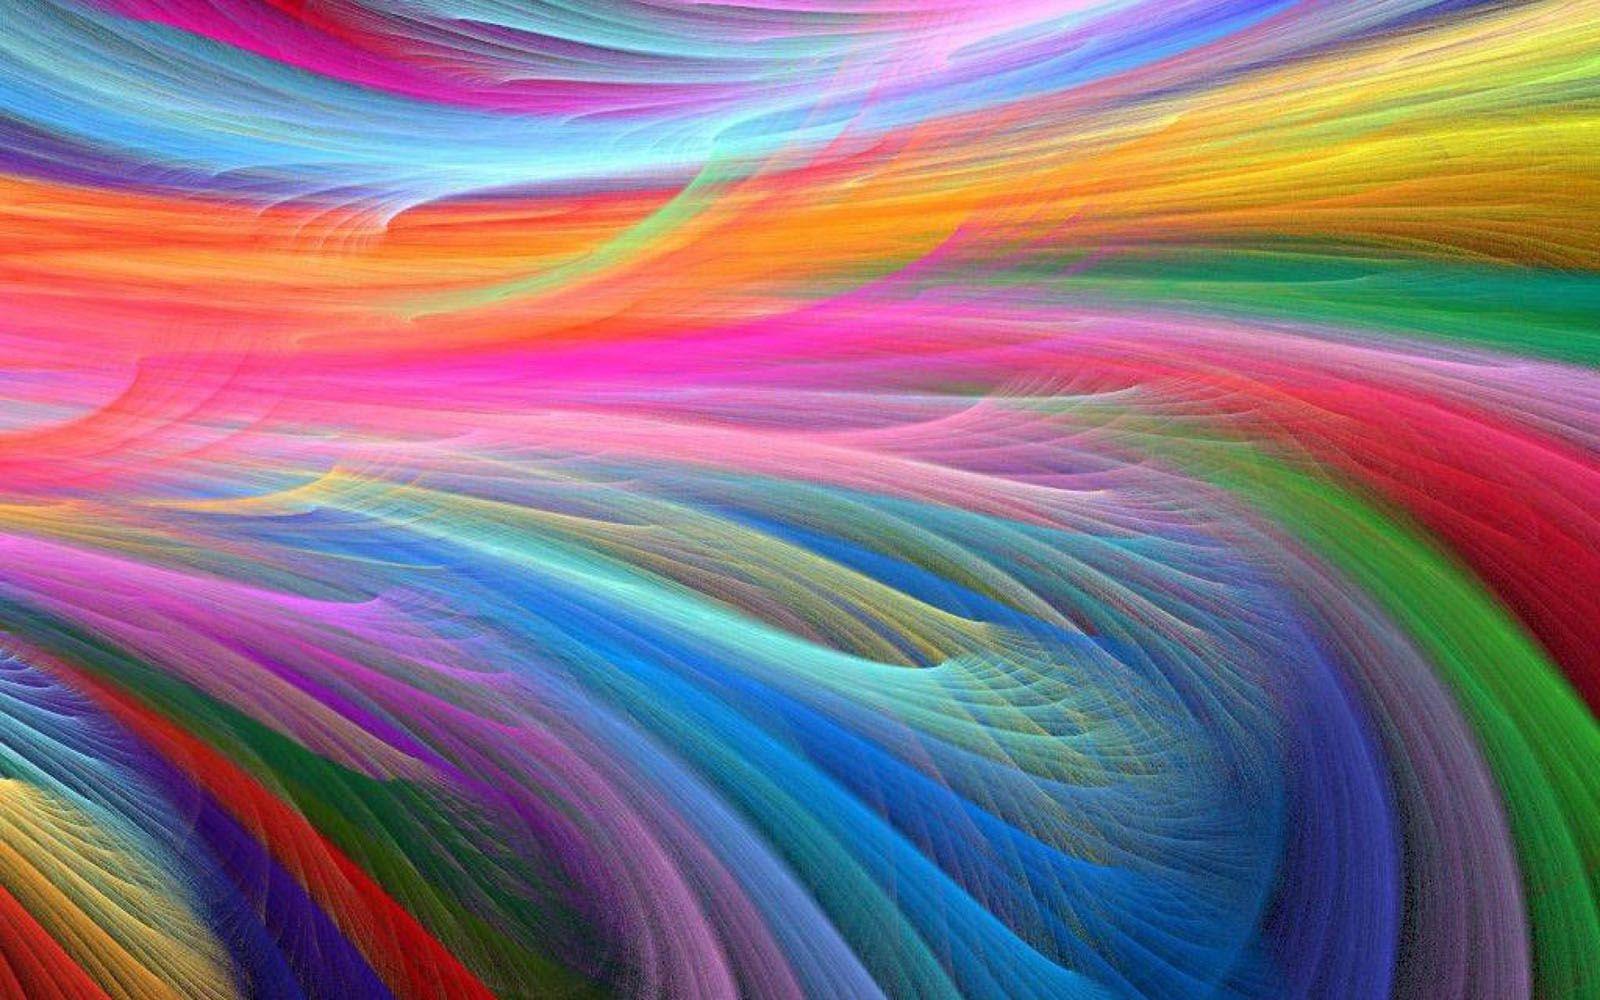 Colorful Abstract Art Wallpaper Free Rainbow Wallpaper